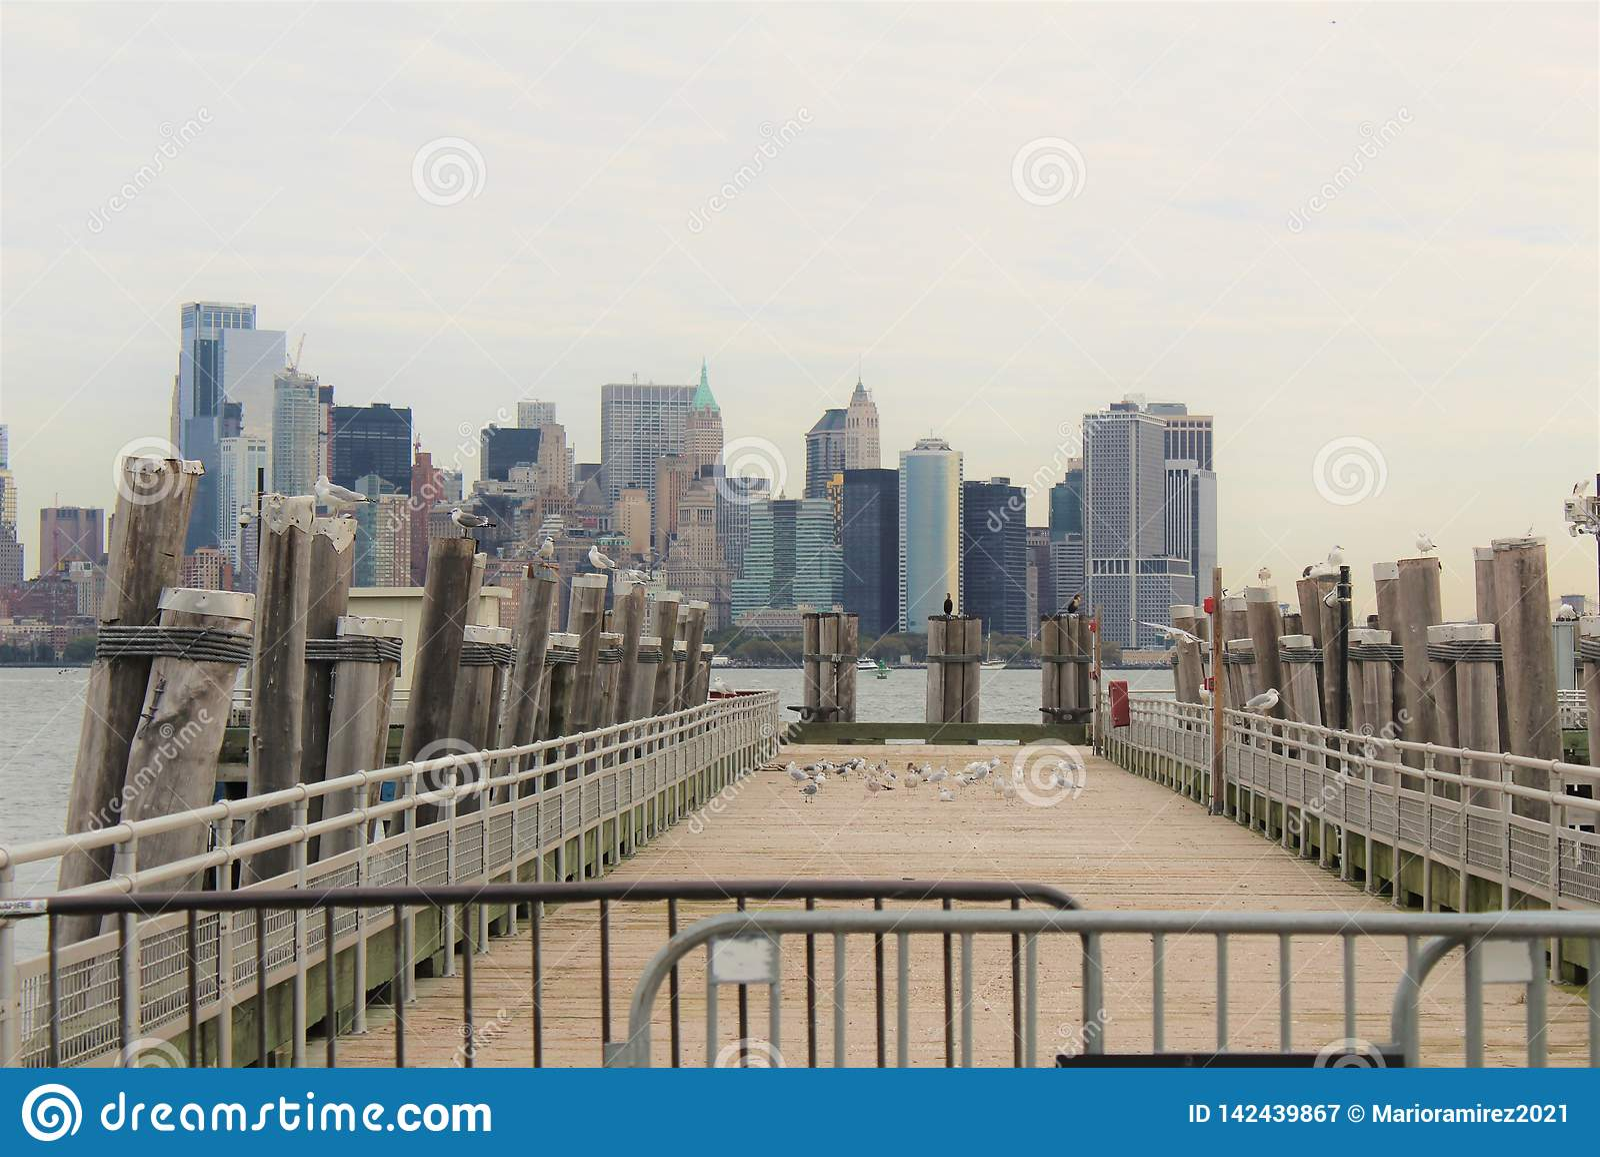 New York City dock